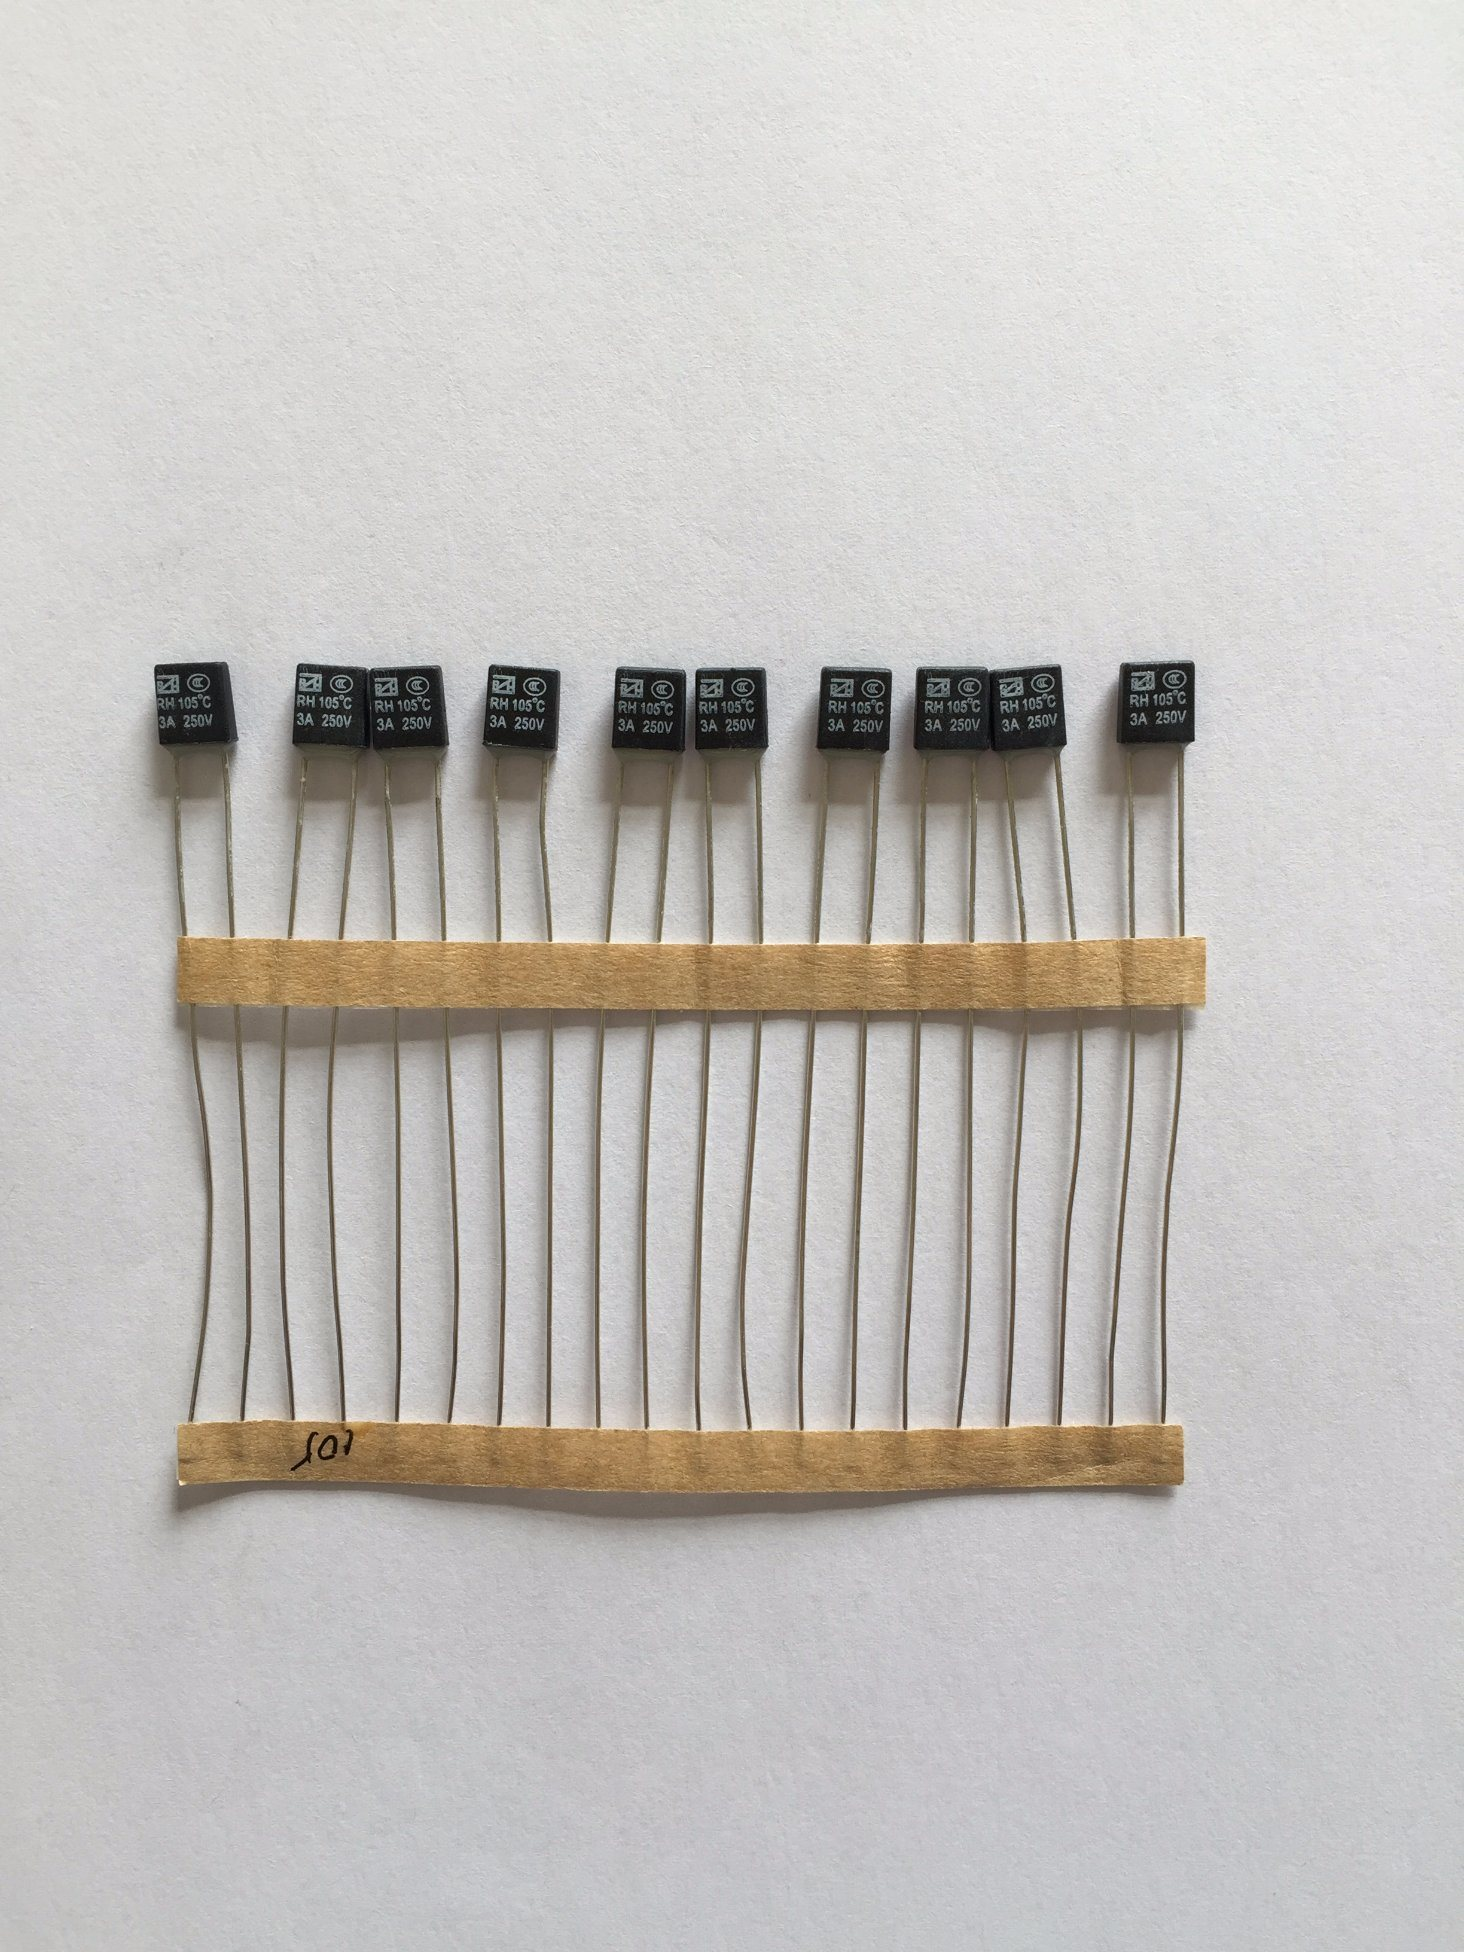 High Quality Ceramic Type Thermal Cutoff Fuse